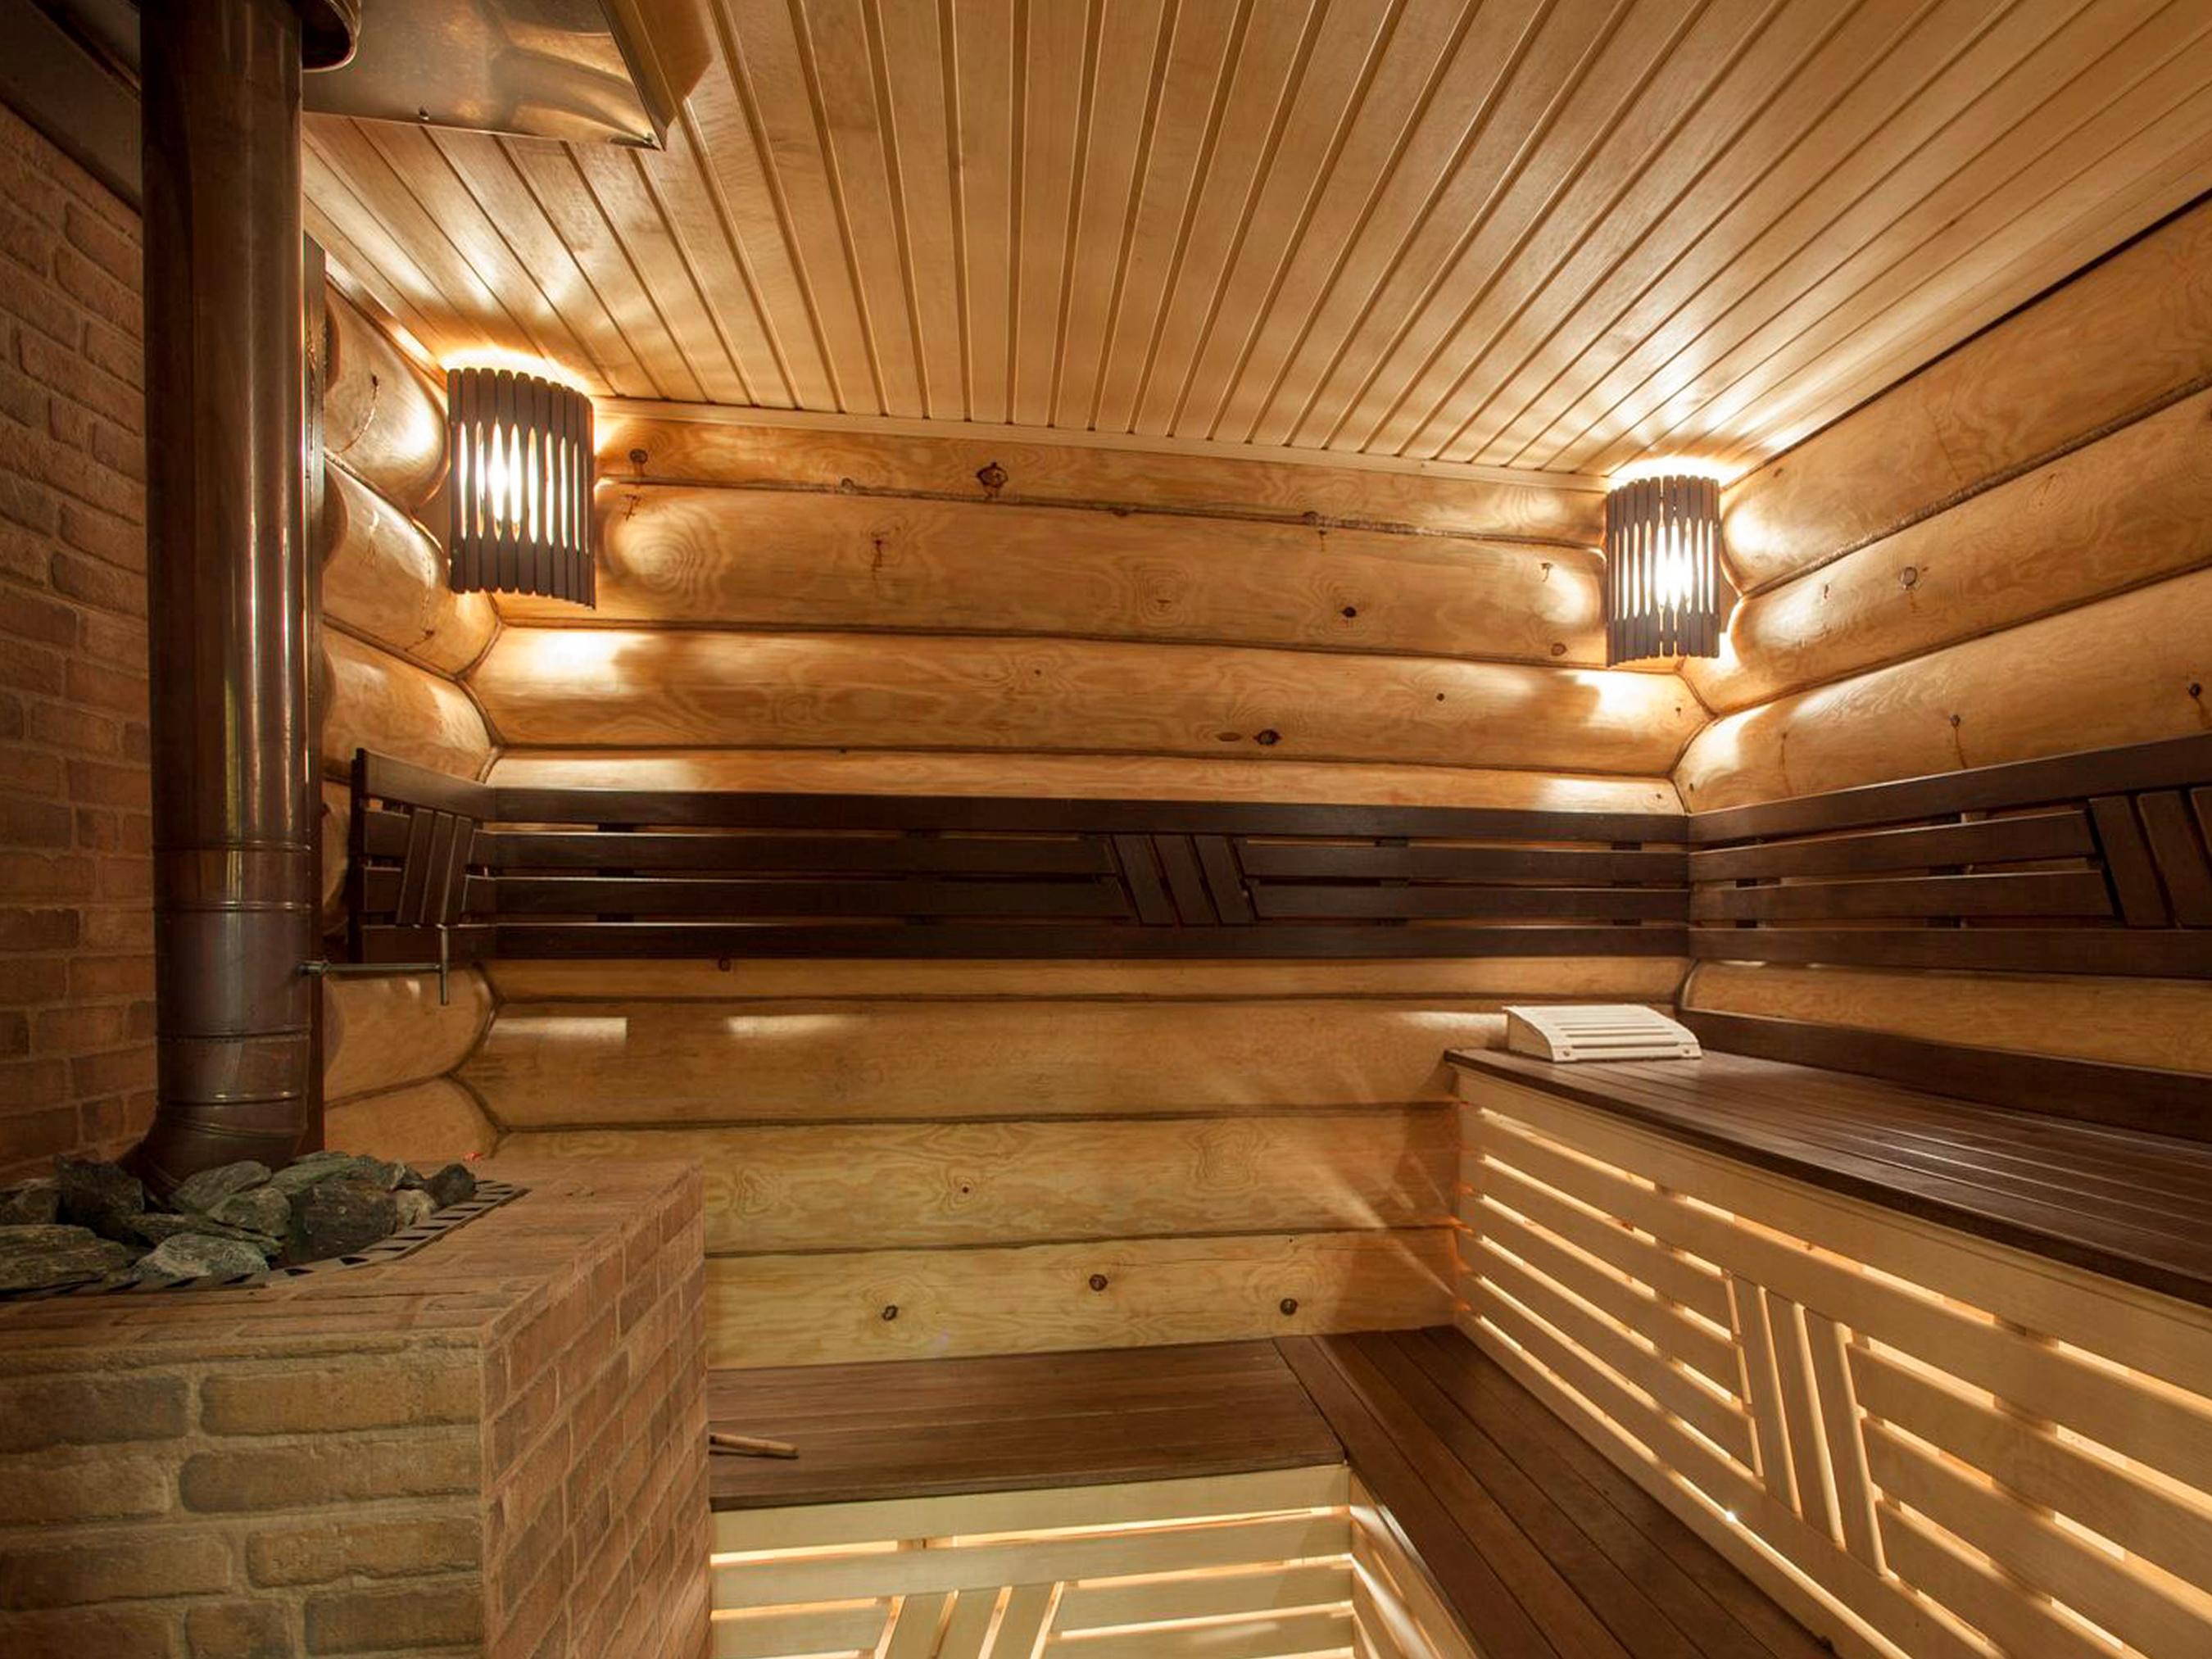 Sausa pirtis (sauna)